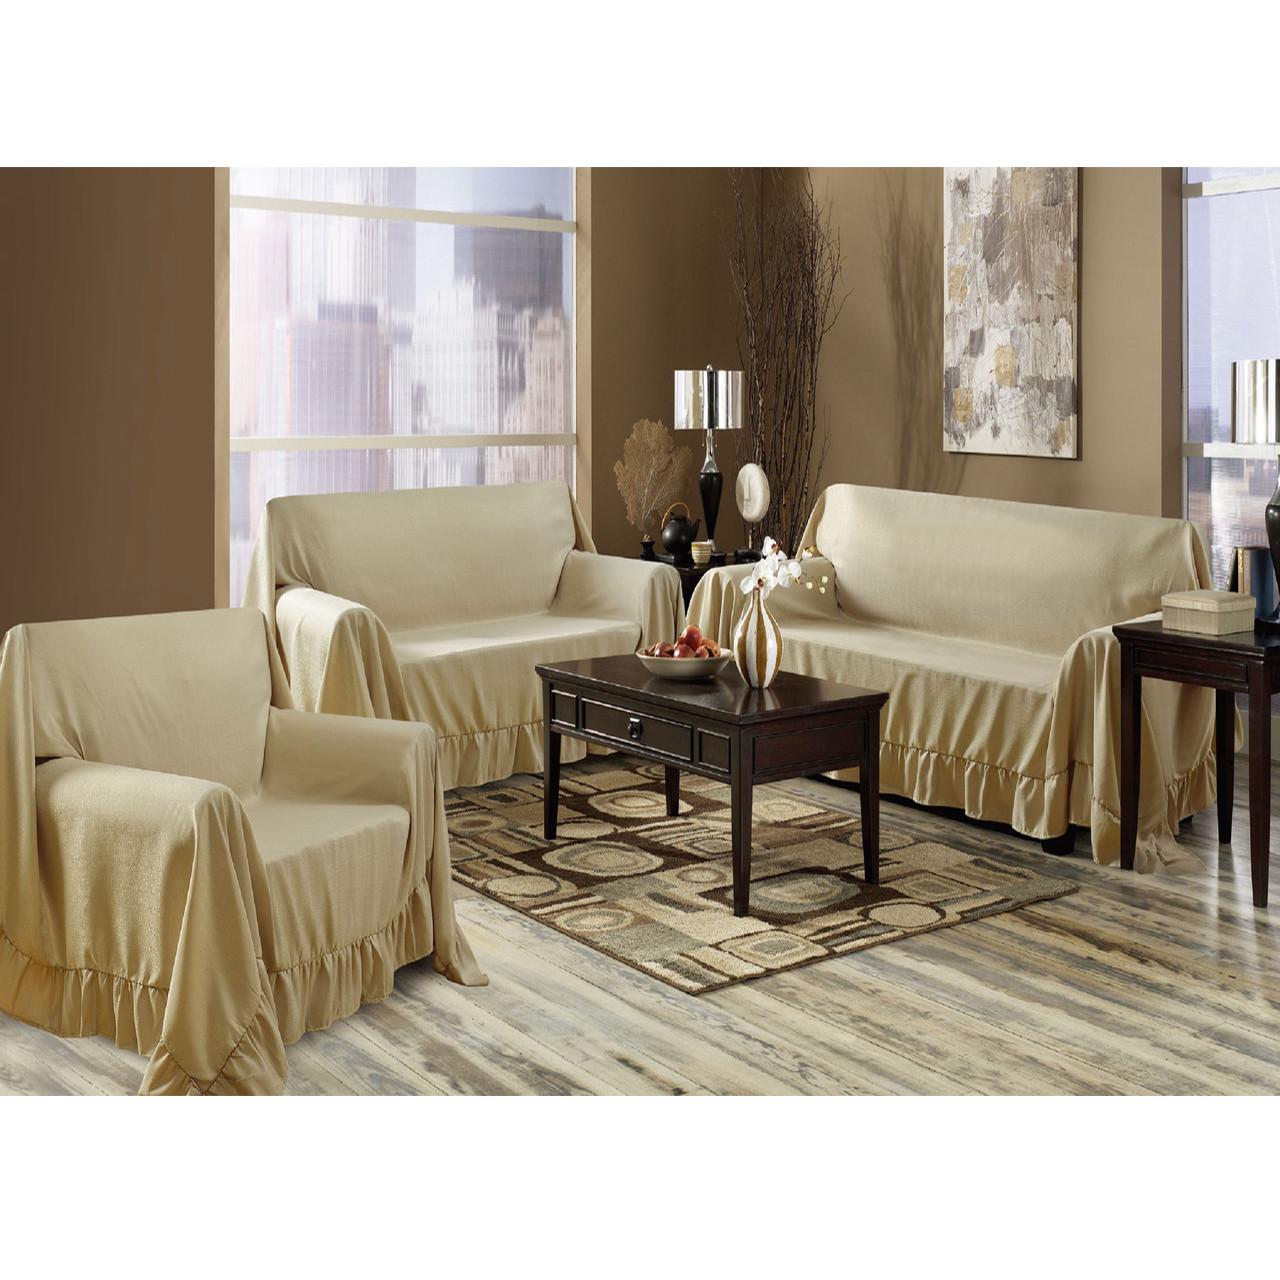 Venice 3 Piece Sofa, Loveseat, Chair Protector Throw Cover